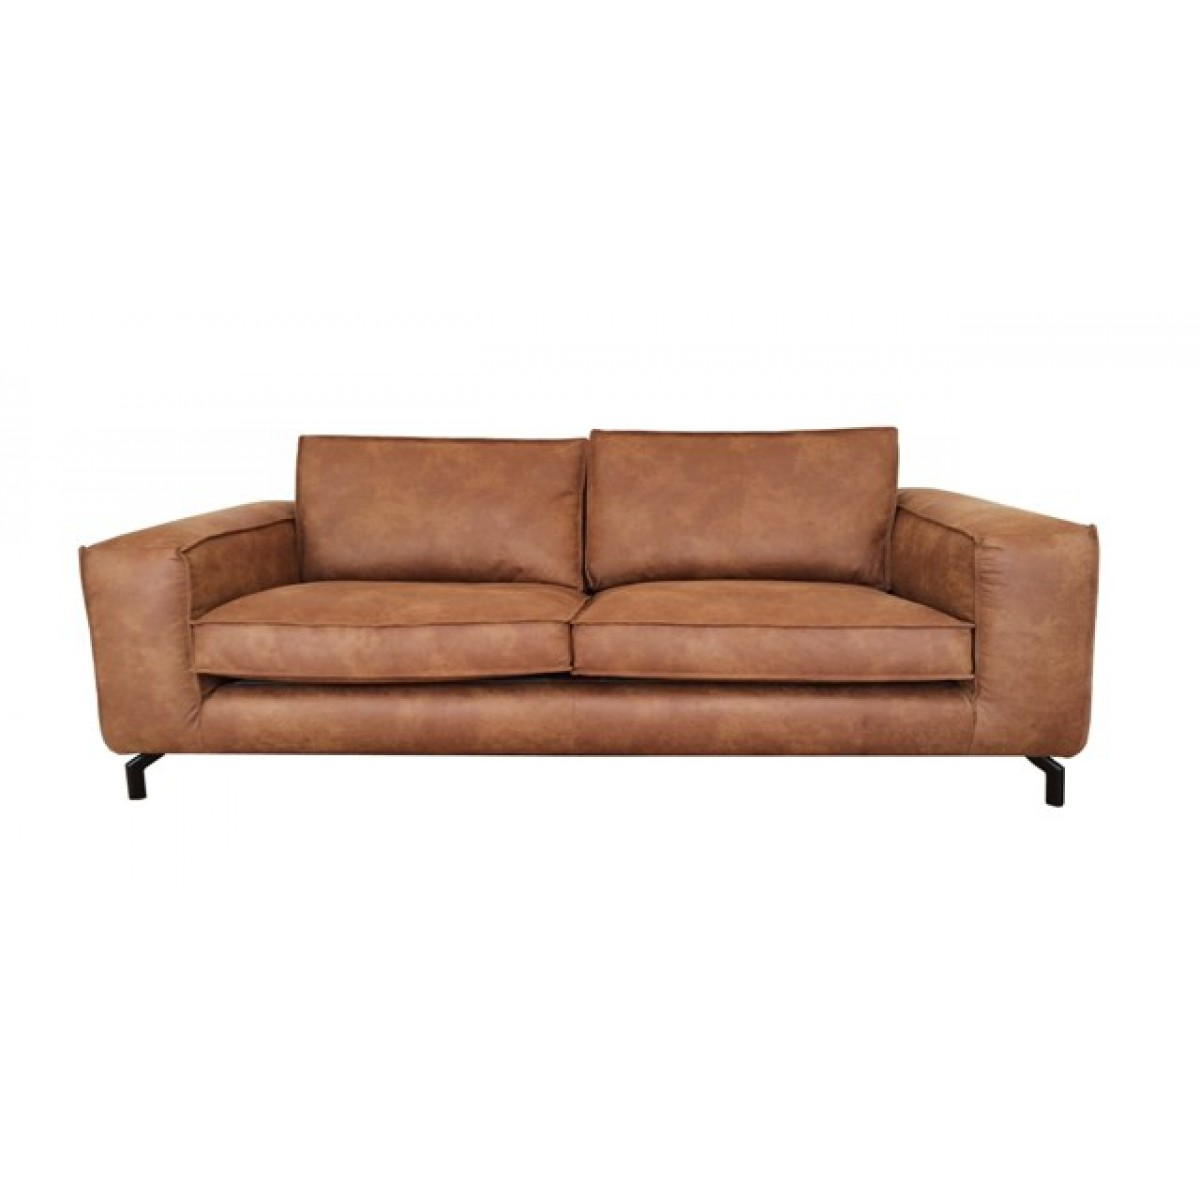 valerio-bank-colorado-leder-easy-sofa